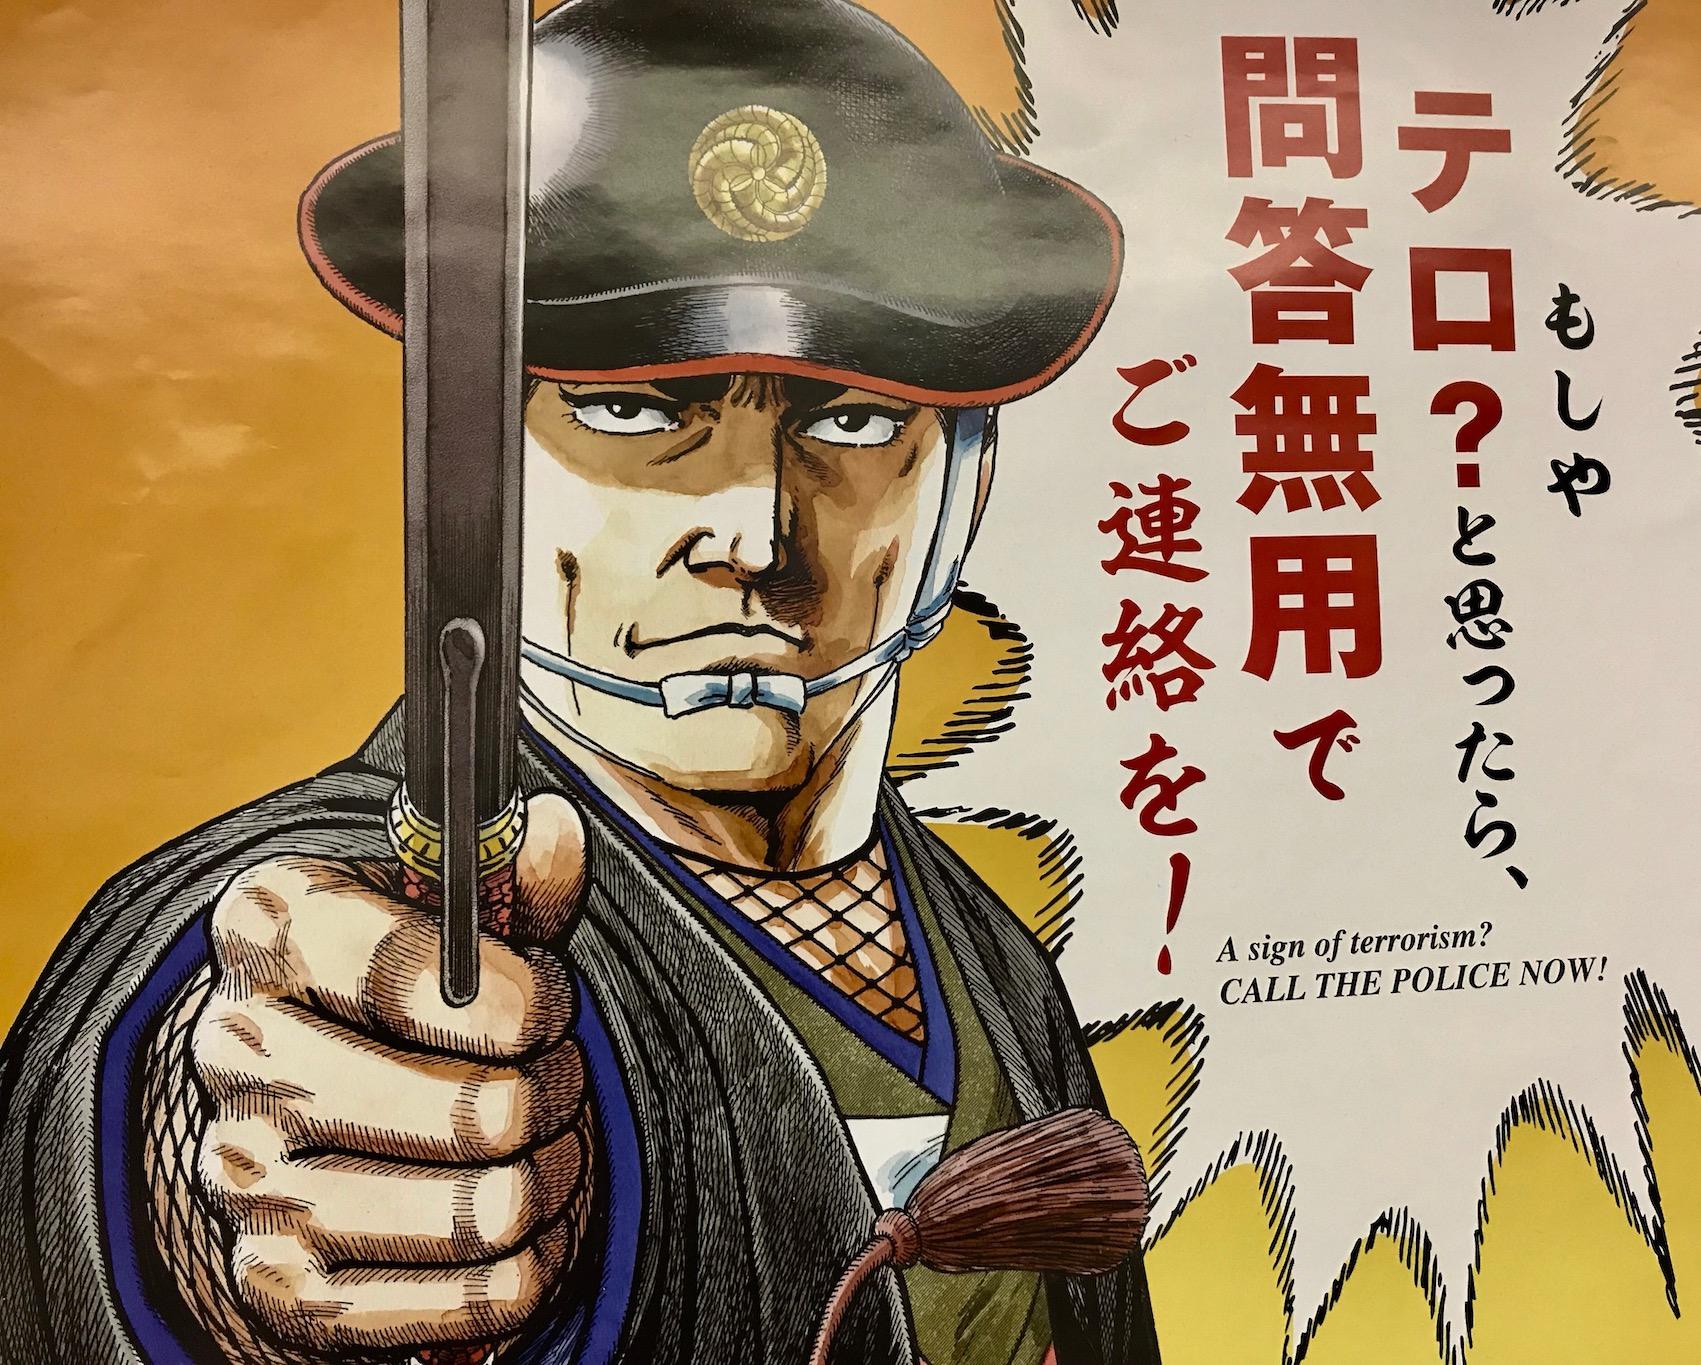 Anti terrorism poster The Tokyo Subway.